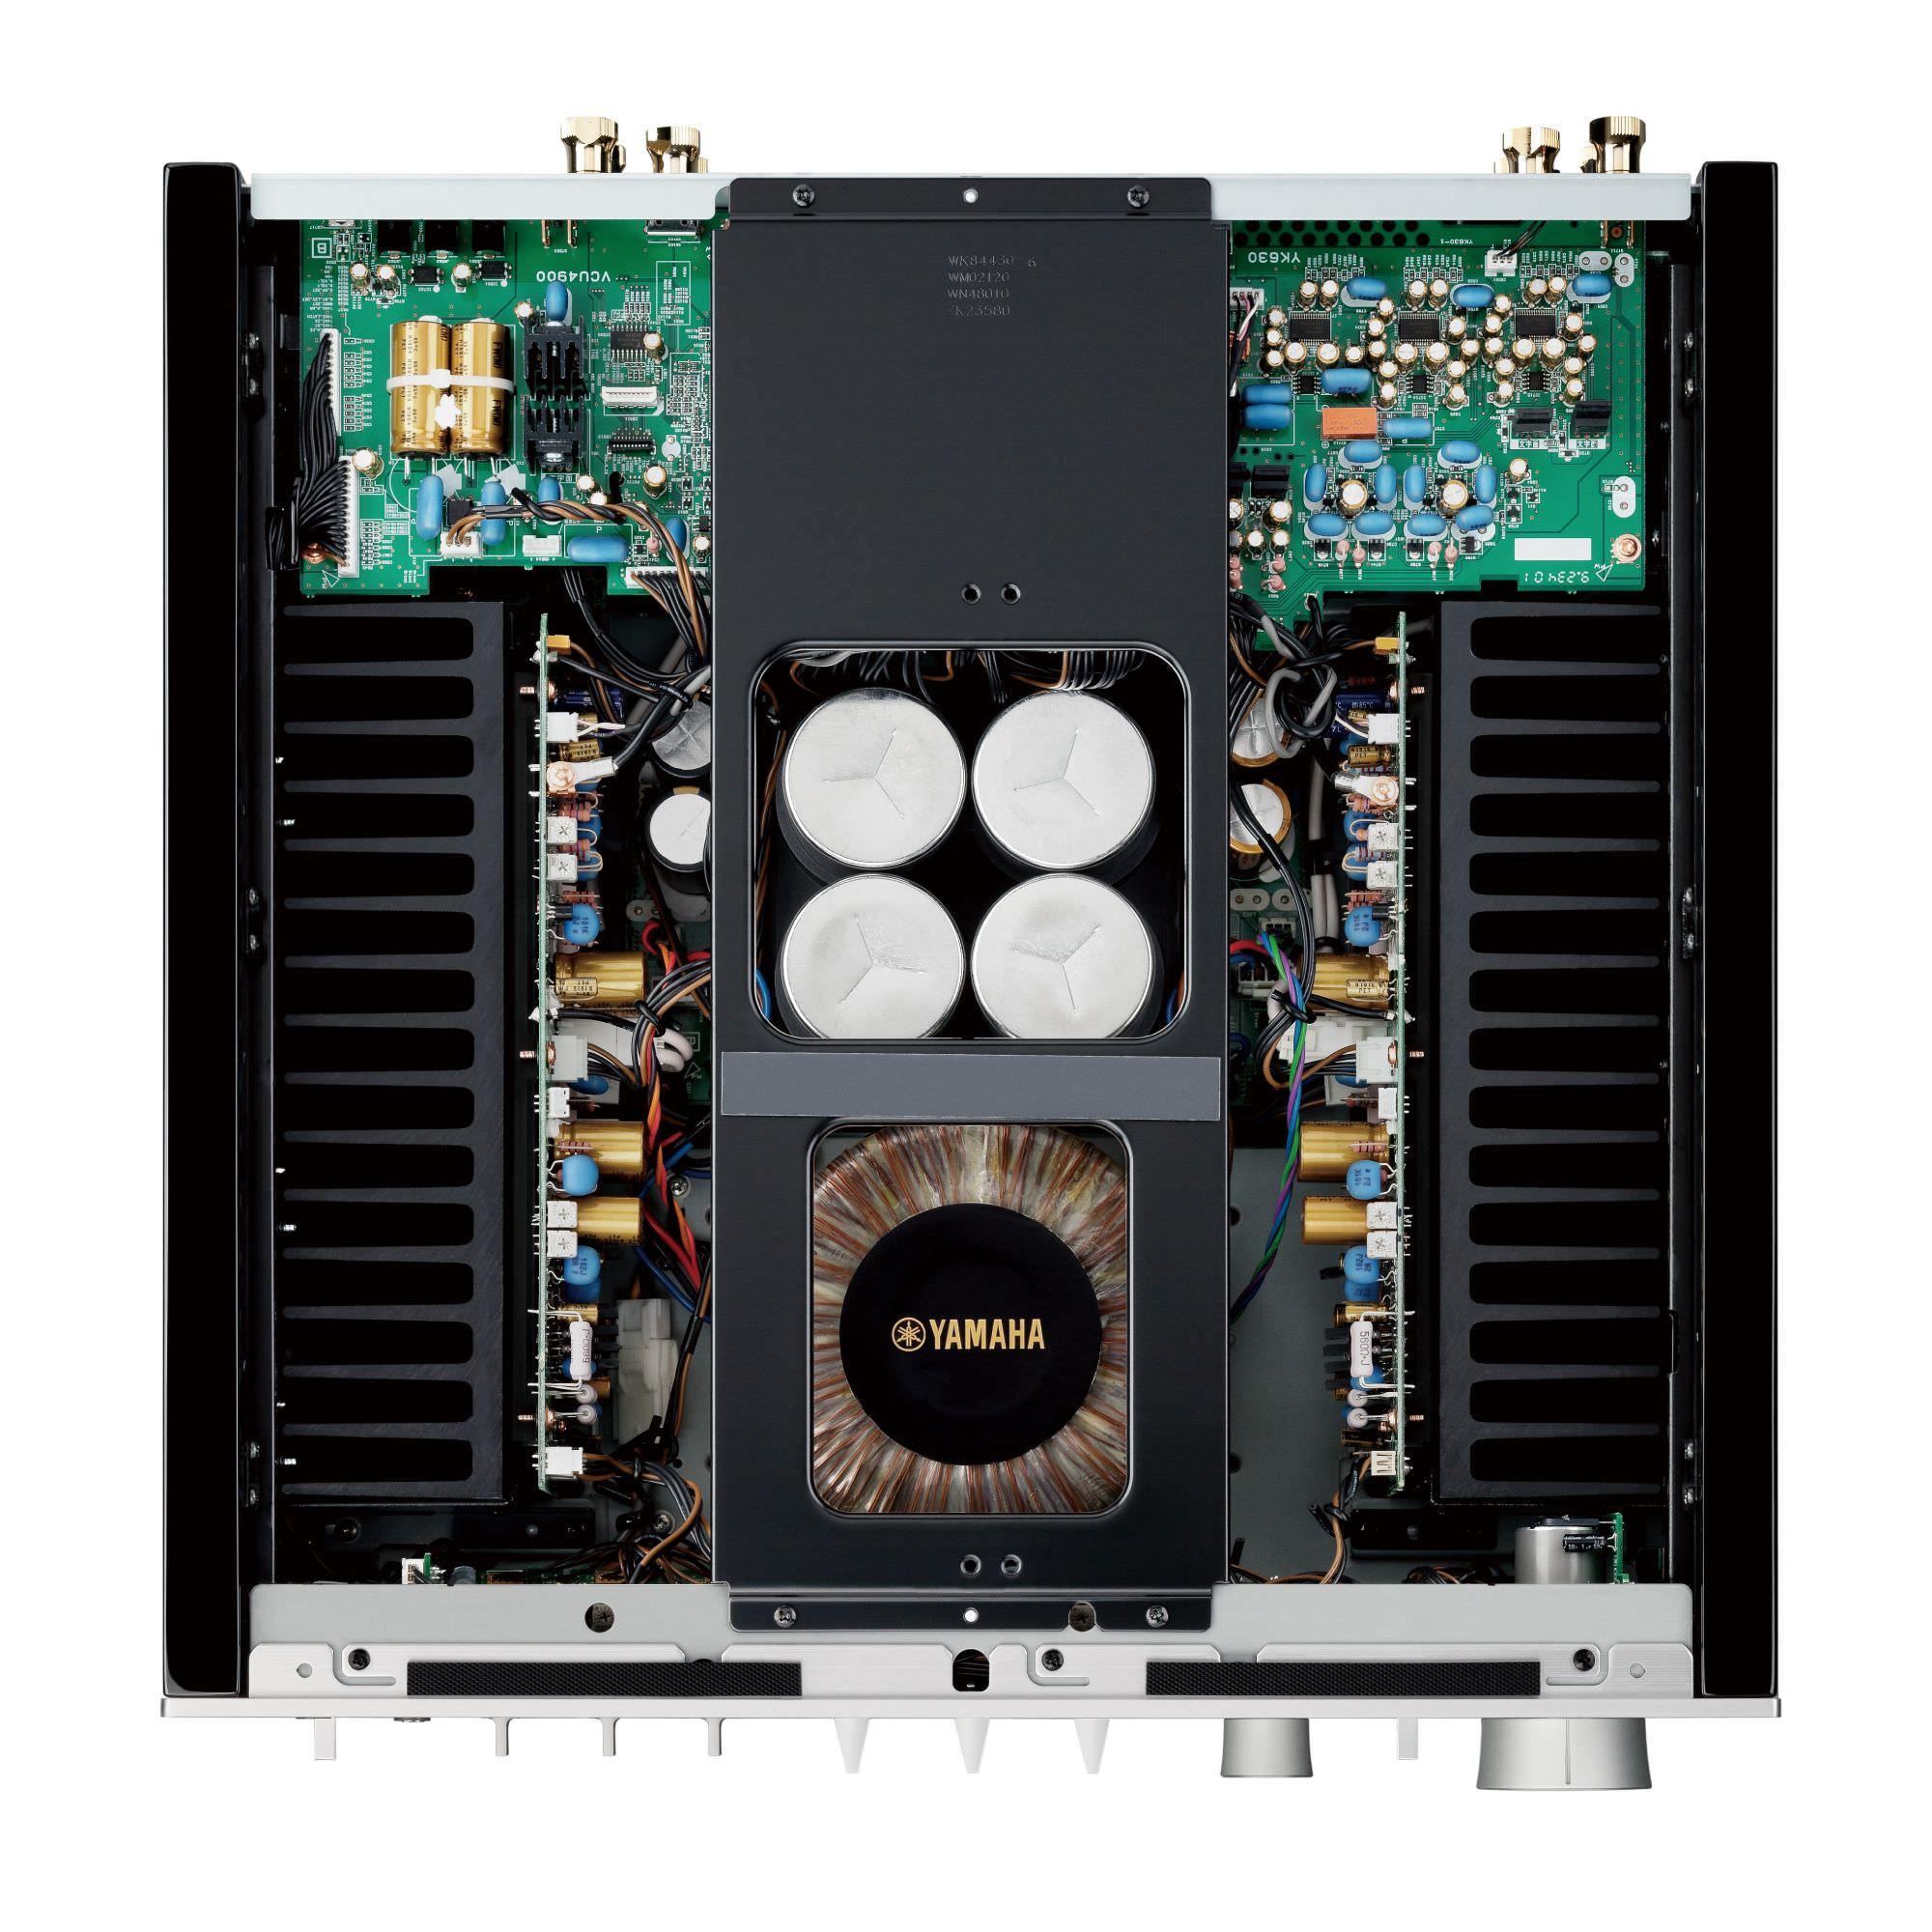 Yamaha A-S2200 Integrated Amplifier Interior